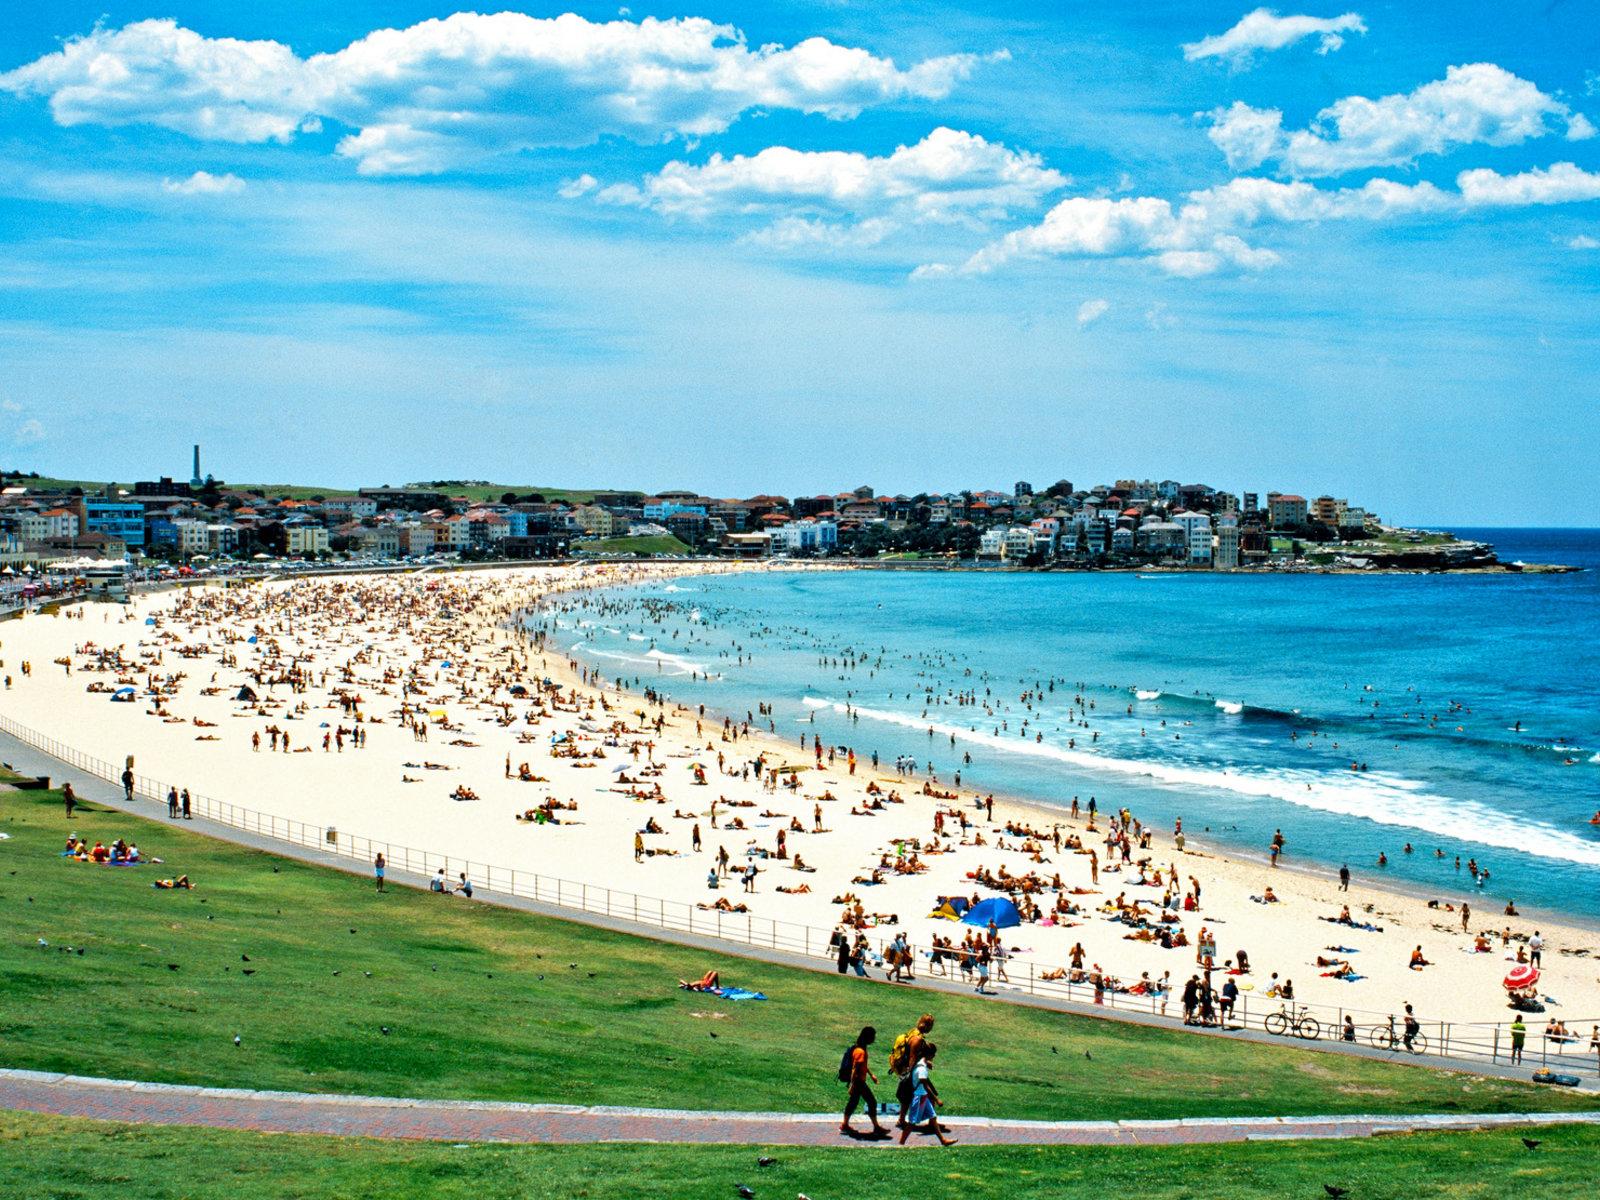 Sydney, Bondi Beach © Tourism Australia